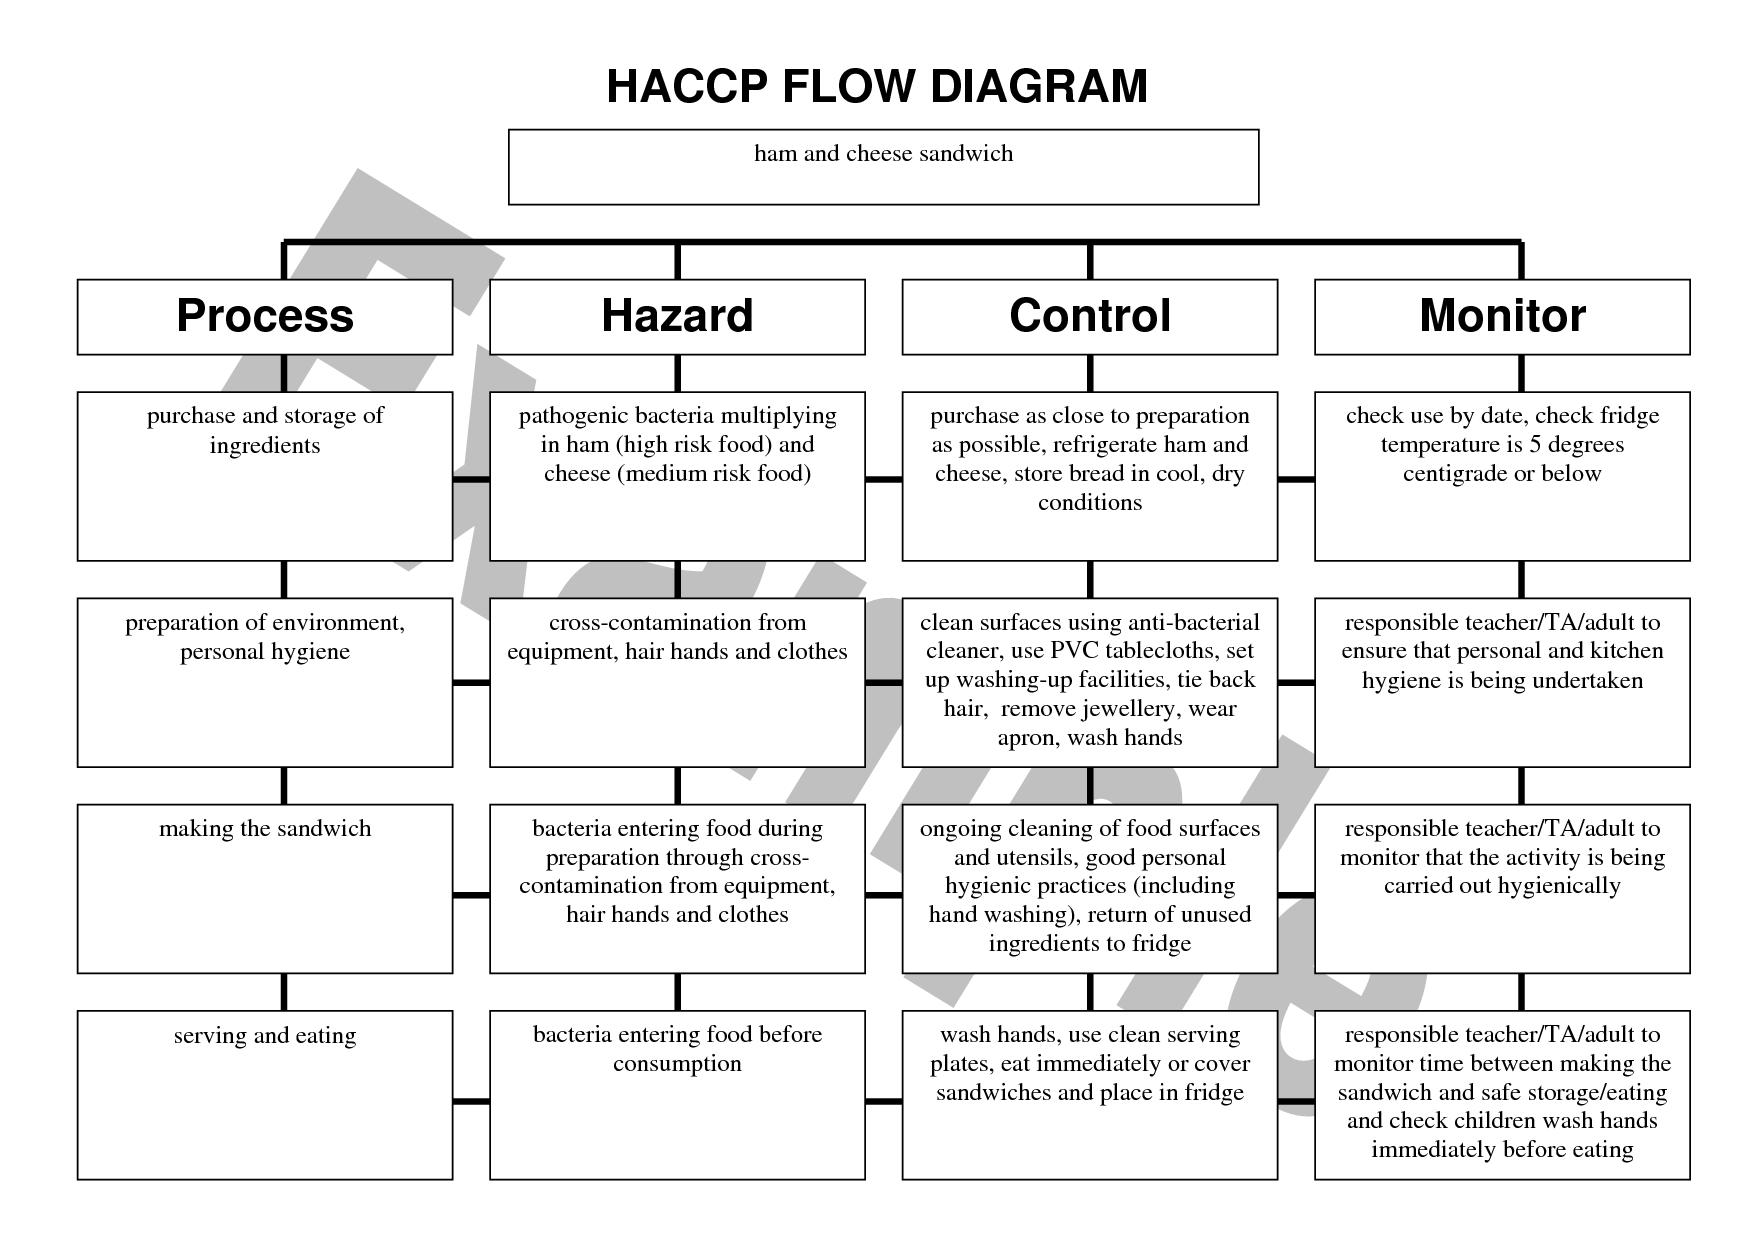 Greek Yogurt Production Process Flow Diagram